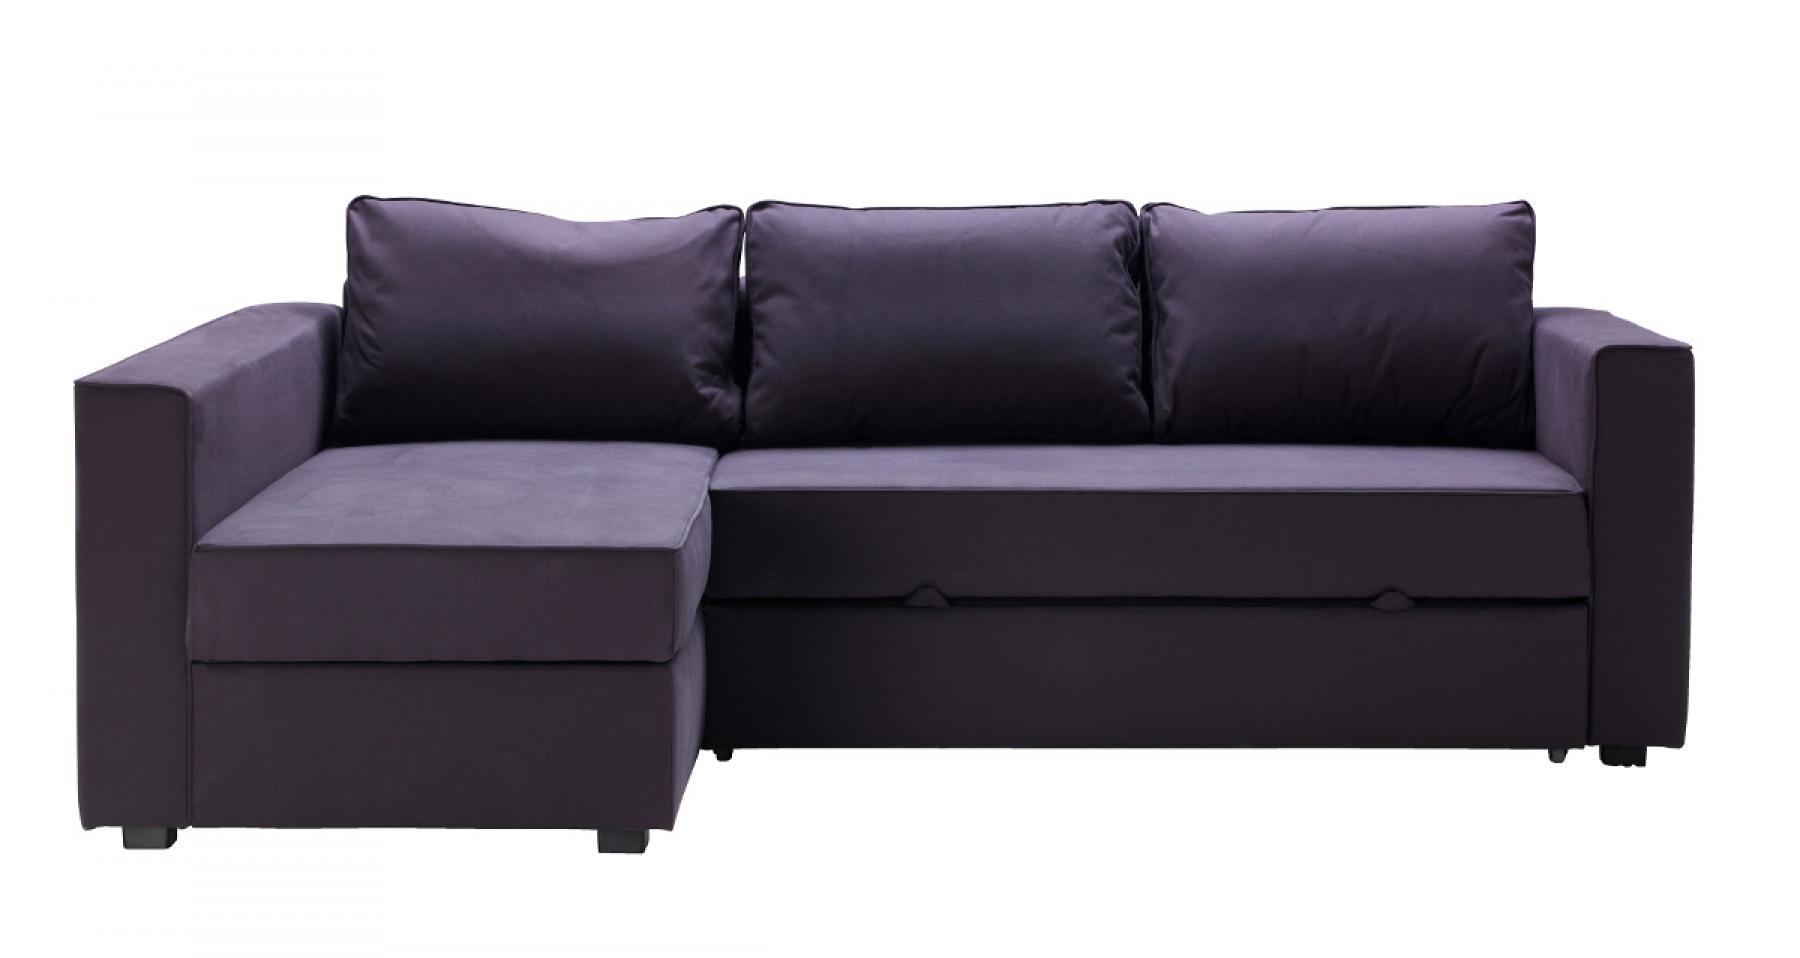 Canapé Convertible Angle Ikea Frais Stock Canapé Meri Nne Centralillaw